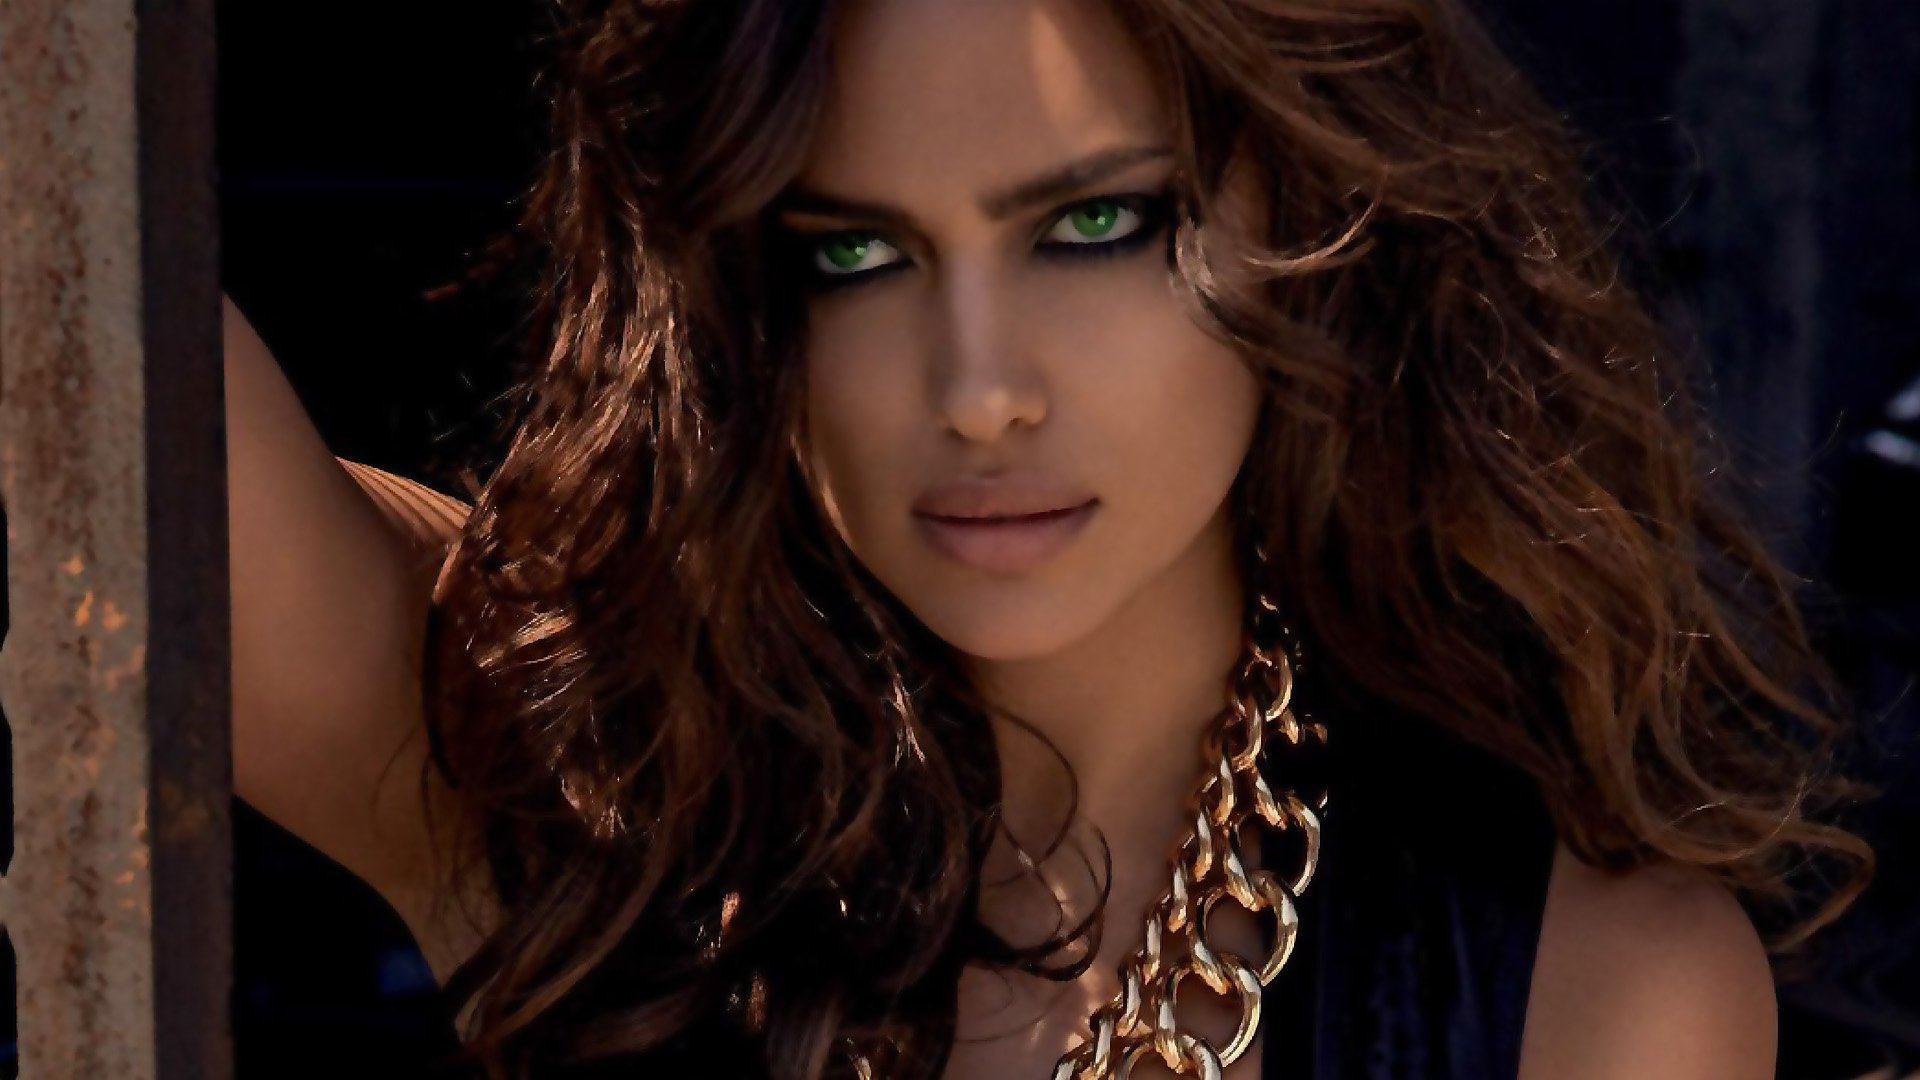 Celebrita' - Irina Shayk  Brunette Modelle Green Eyes Sfondo